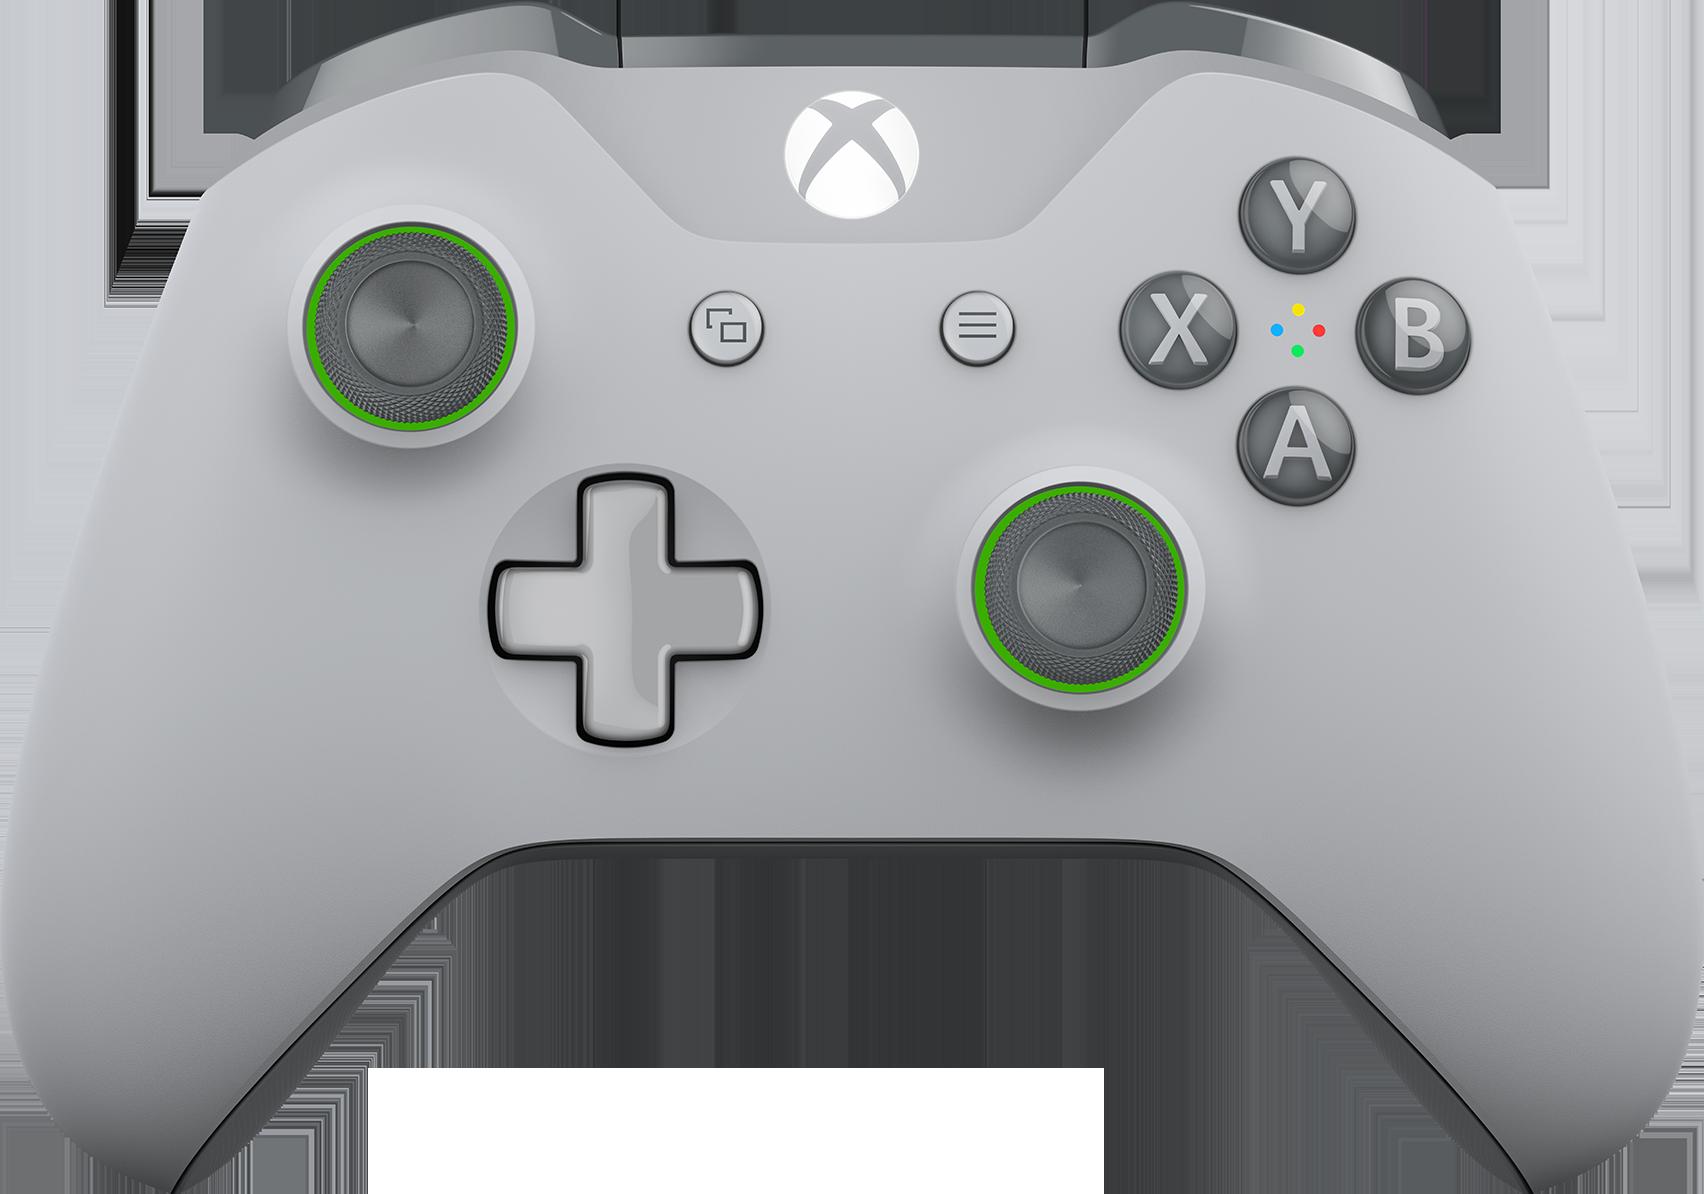 Xbox Wireless Controller – Grey/Green - Microsoft